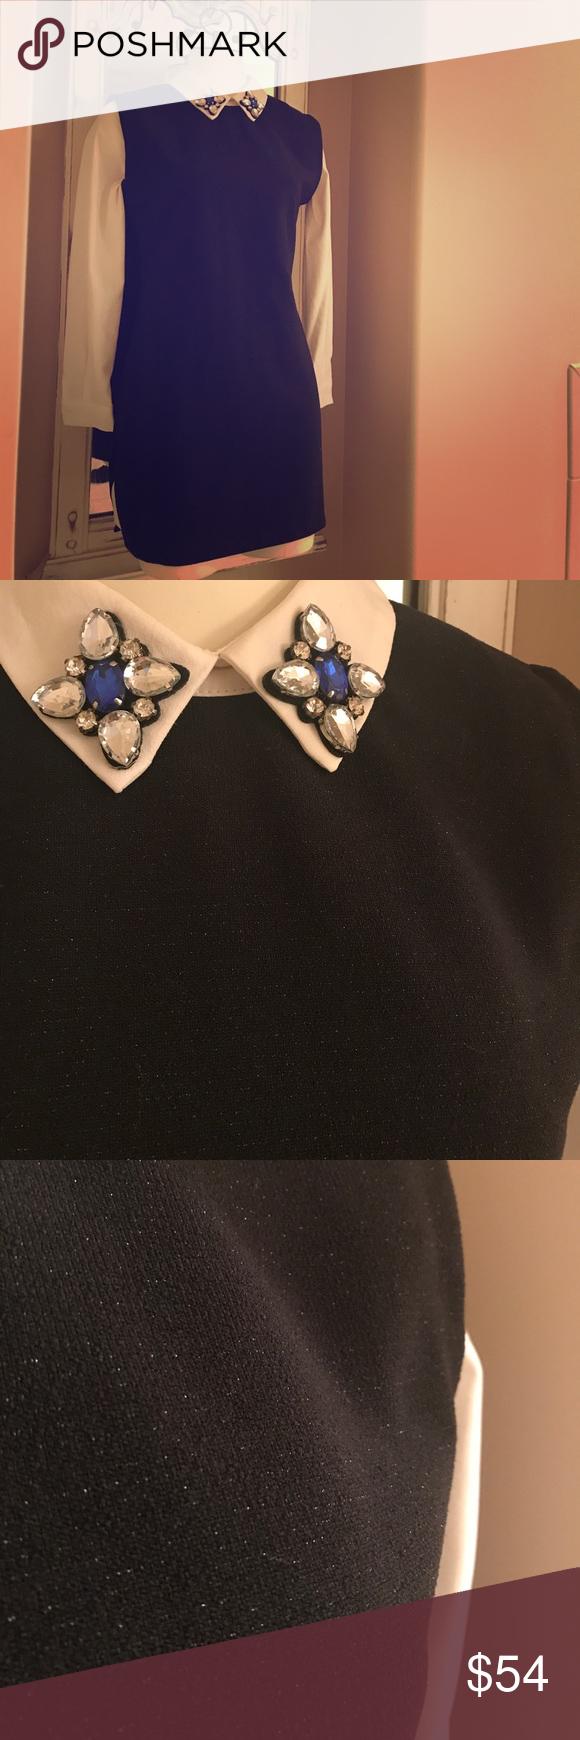 Vintagejewel collar sparkle work dress szm ivory dresses